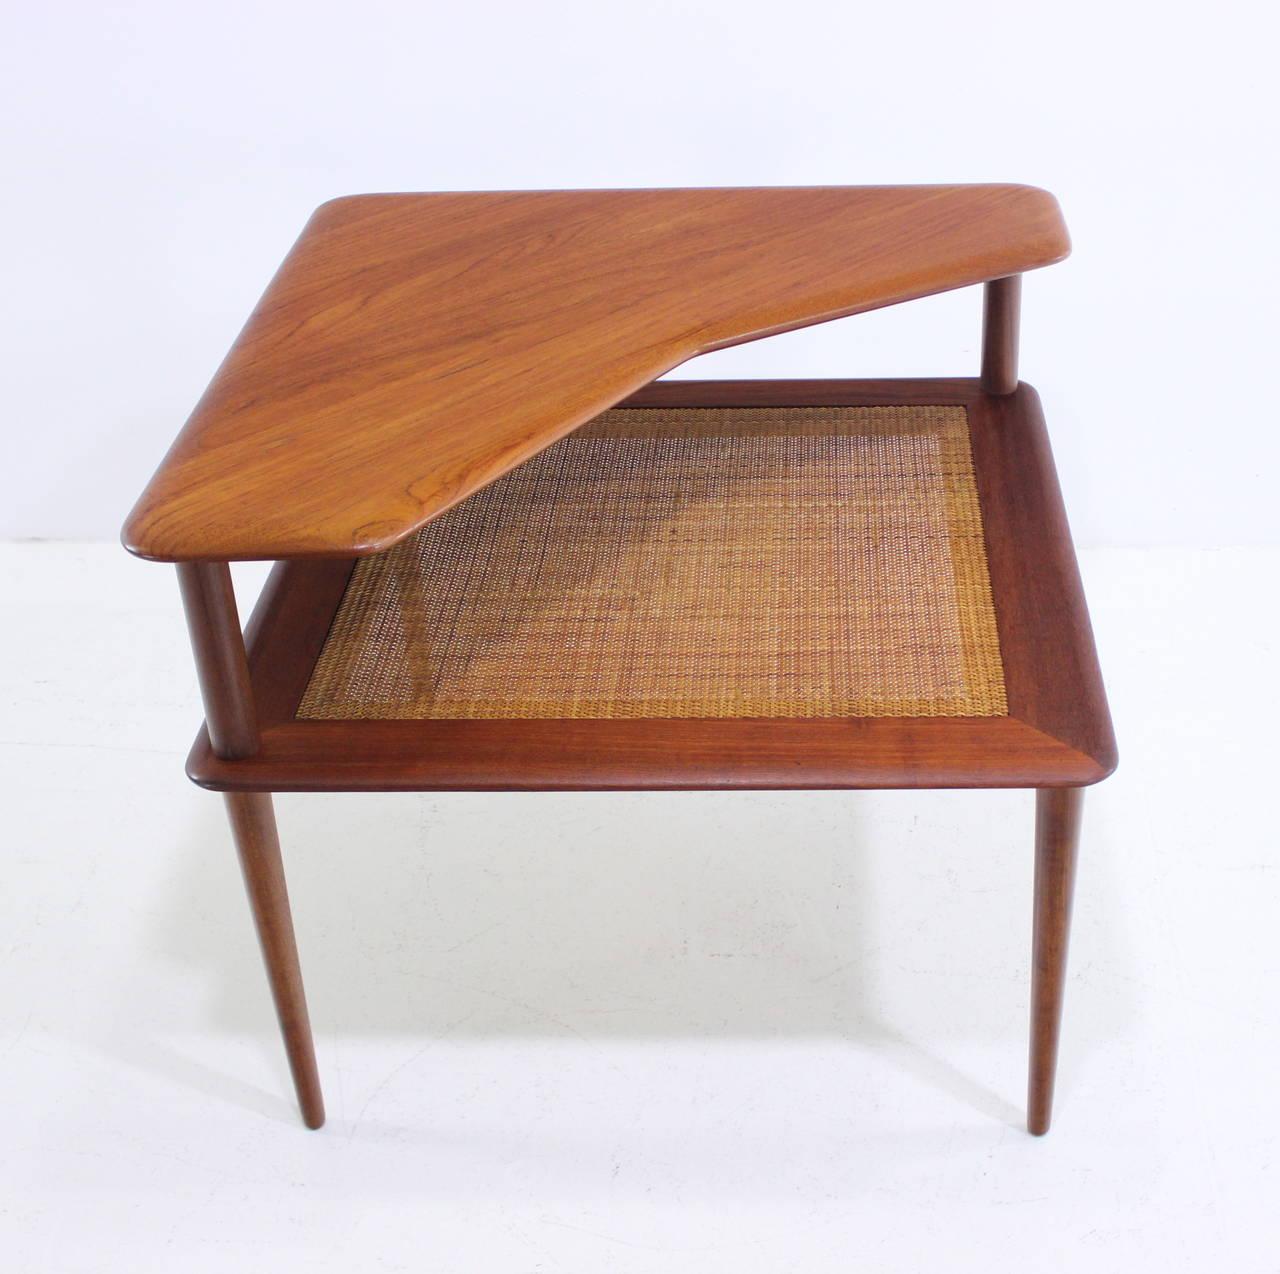 Exceptional Danish Modern Teak Seating Group Designed By Peter Hvidt For Sale